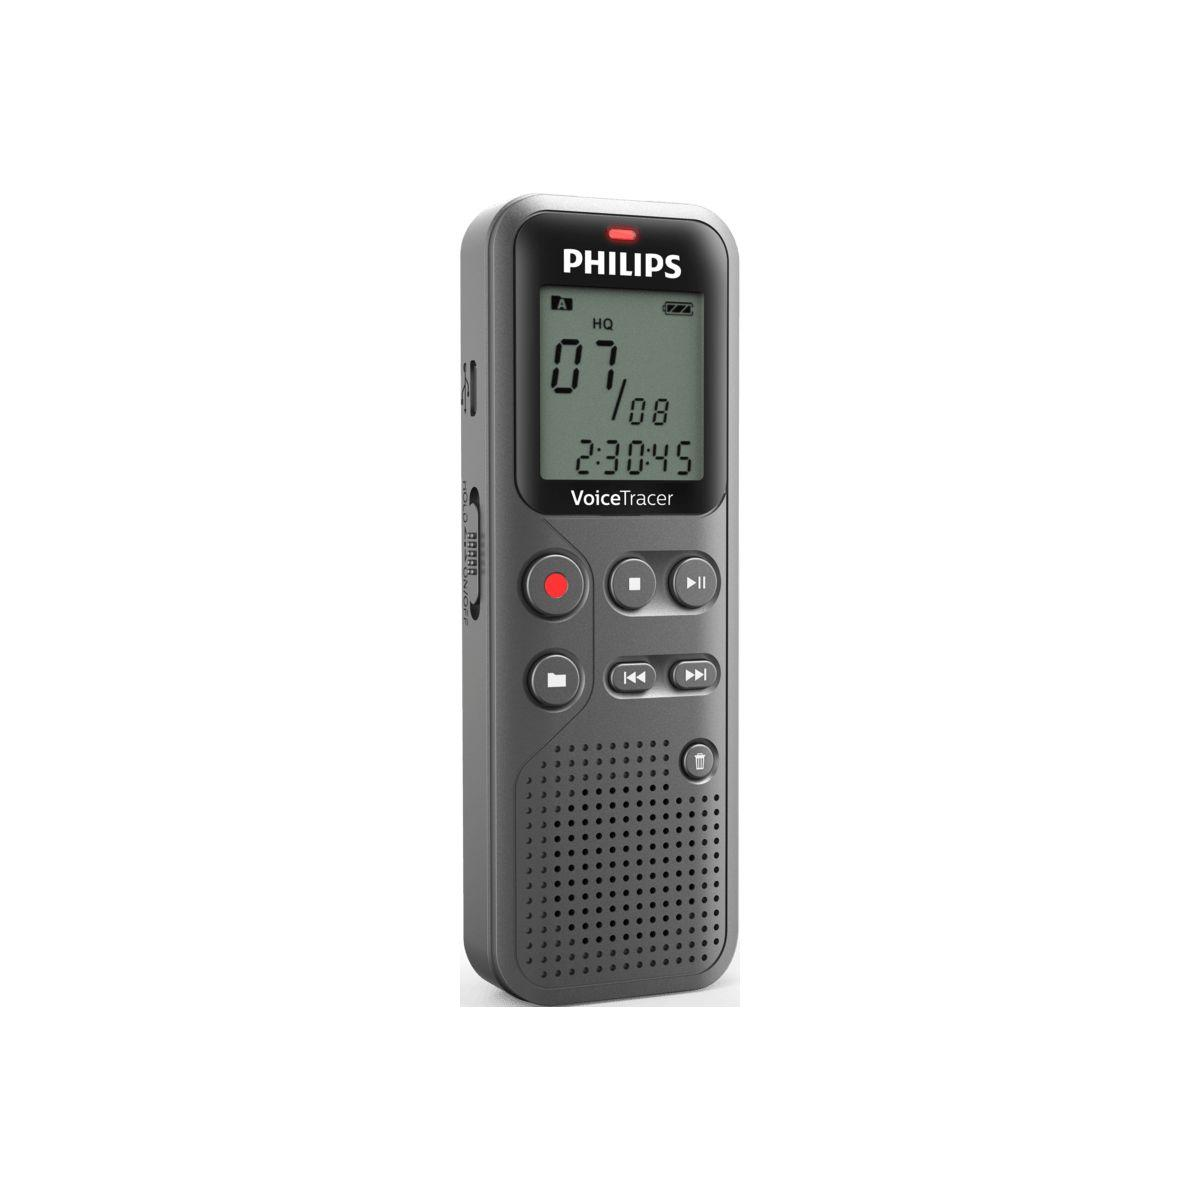 Dictaphone philips dvt1110 - livraison offerte : code liv